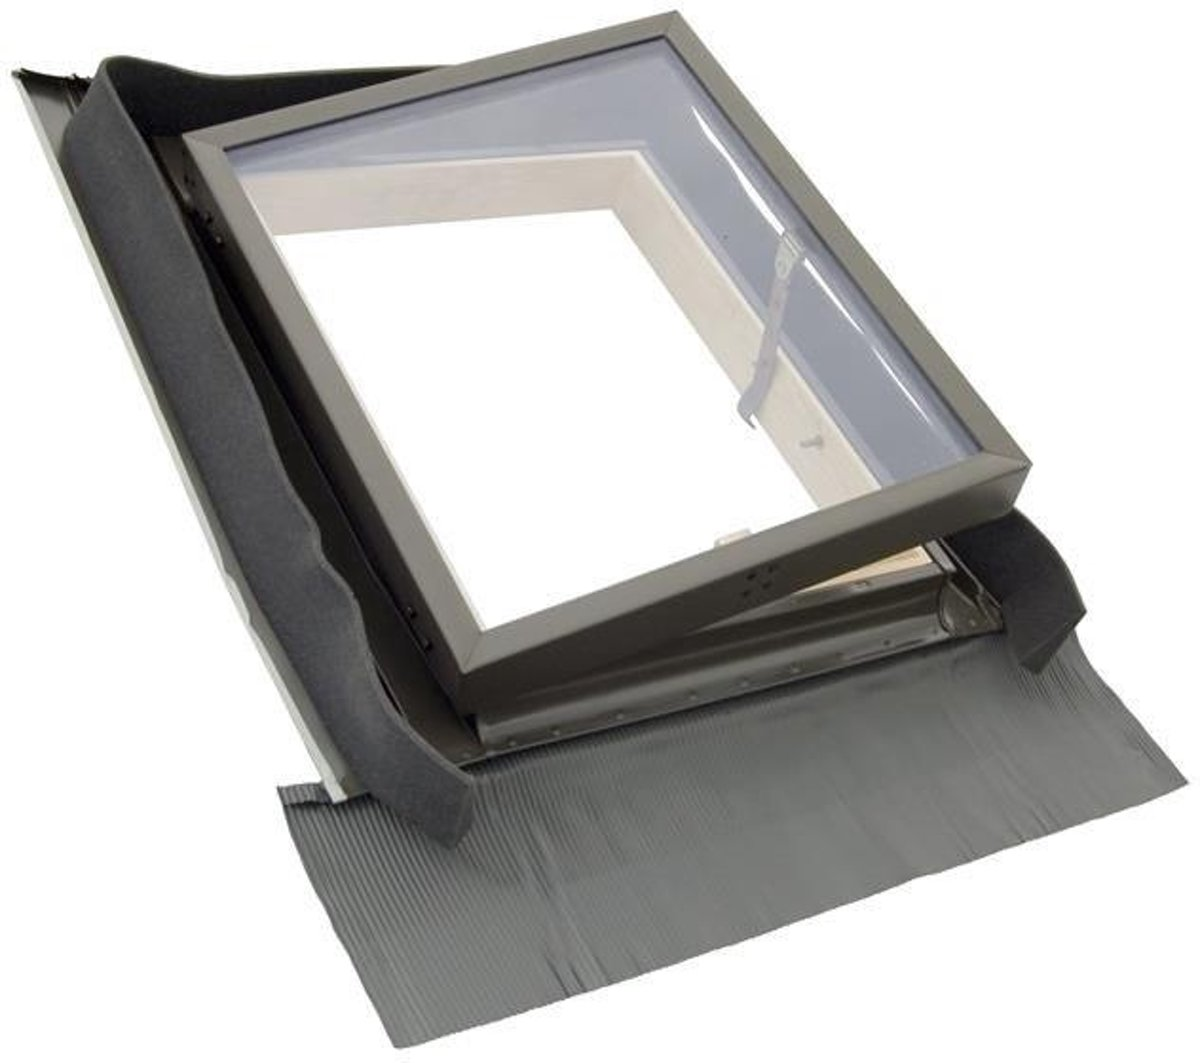 Zolderraam / dakraam FENSTRO dubbelglas 45x55